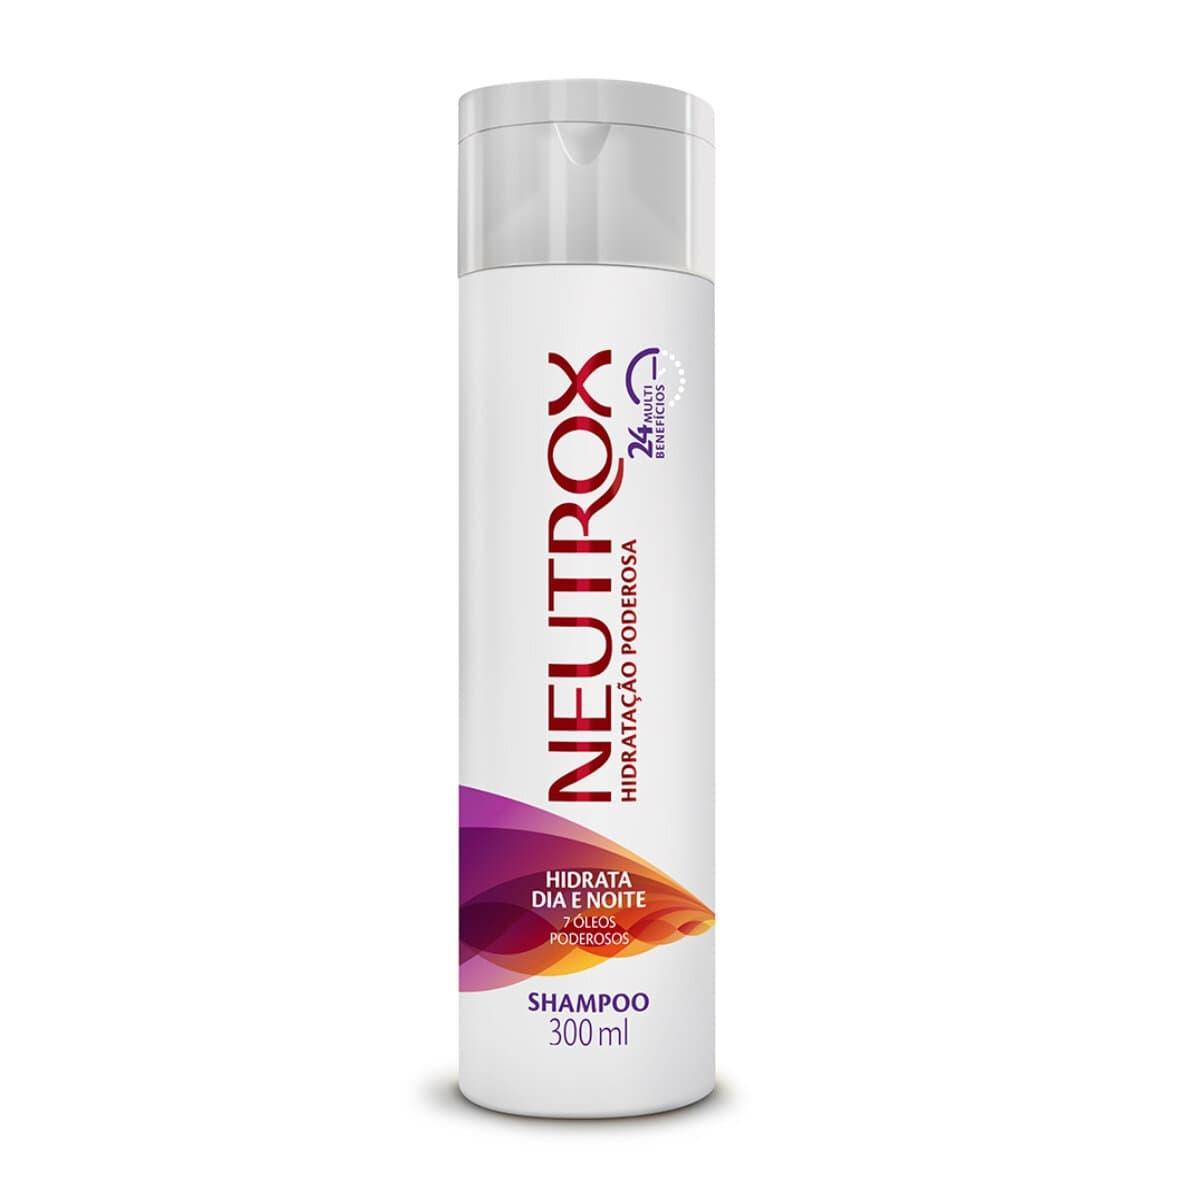 Shampoo Neutrox 24 Multibenefícios 300ml 300ml